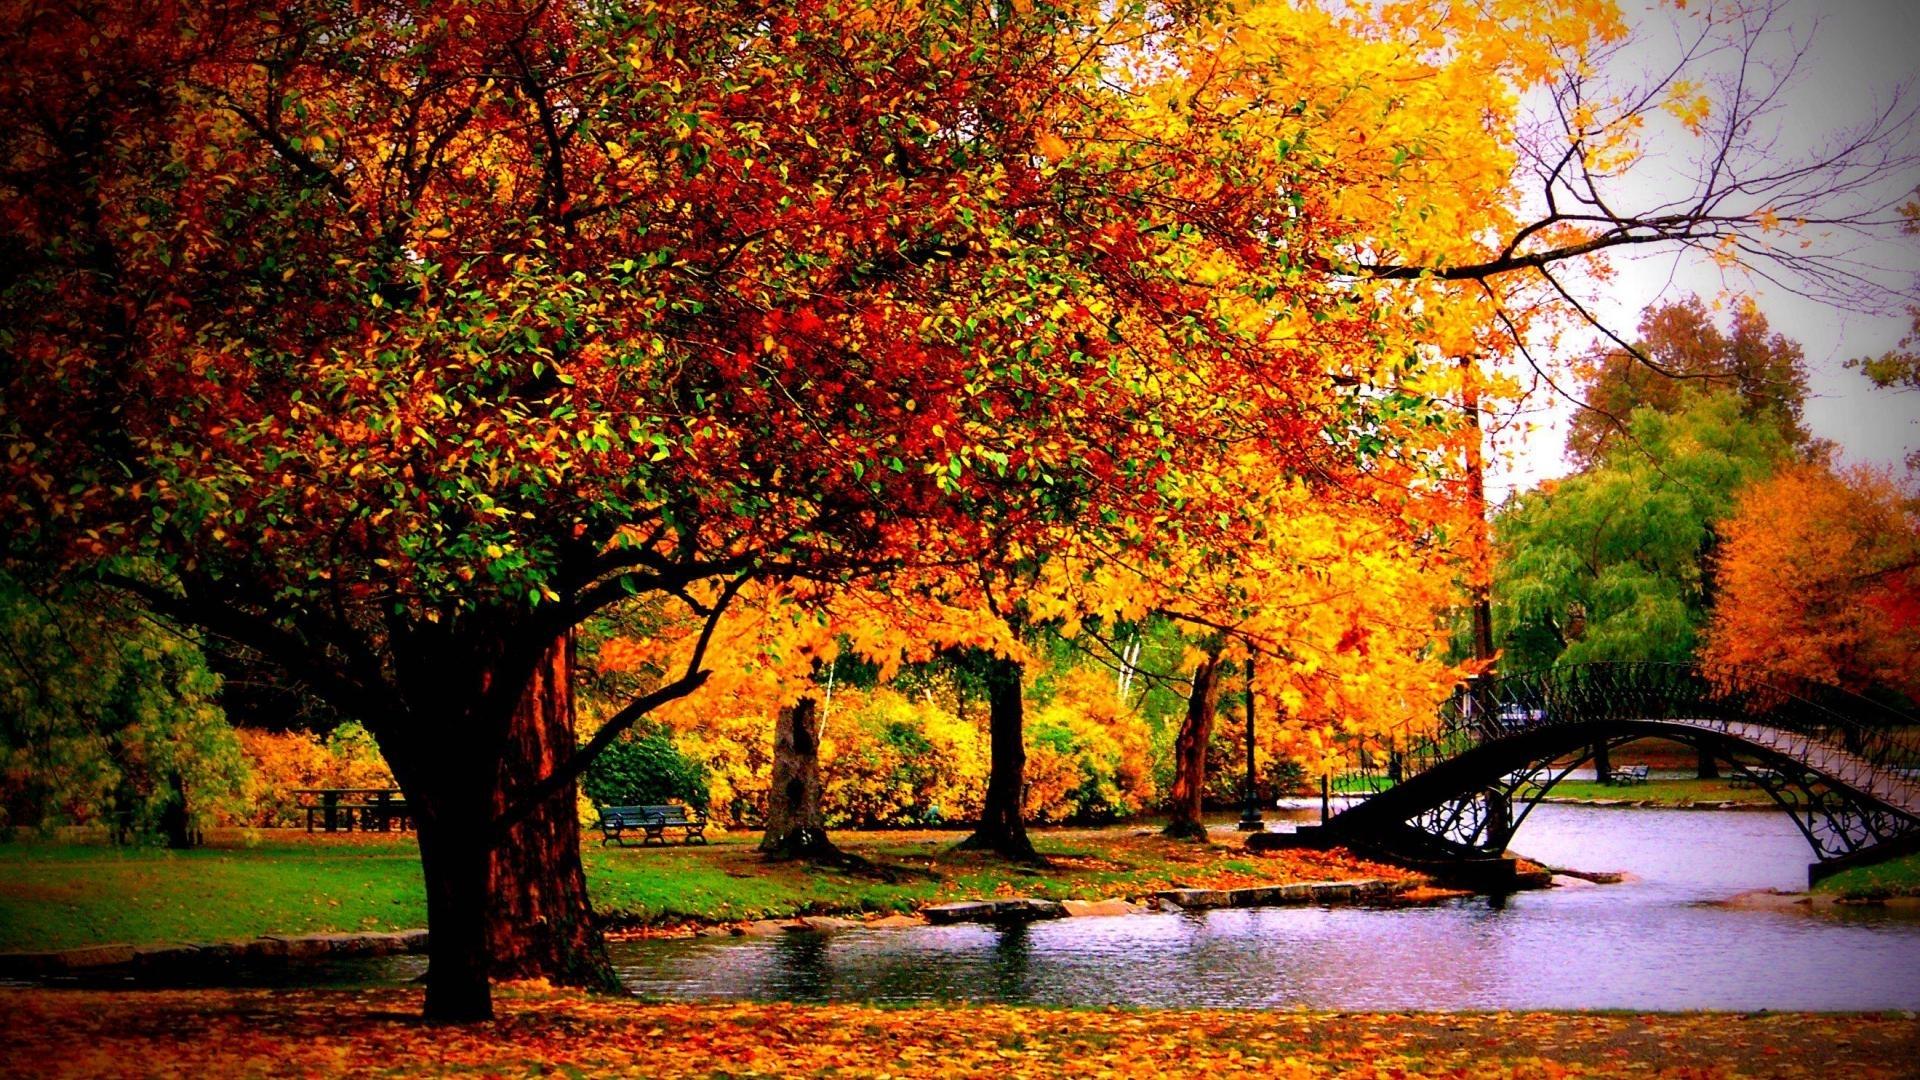 autumn desktop wallpaper hd group with 60 items